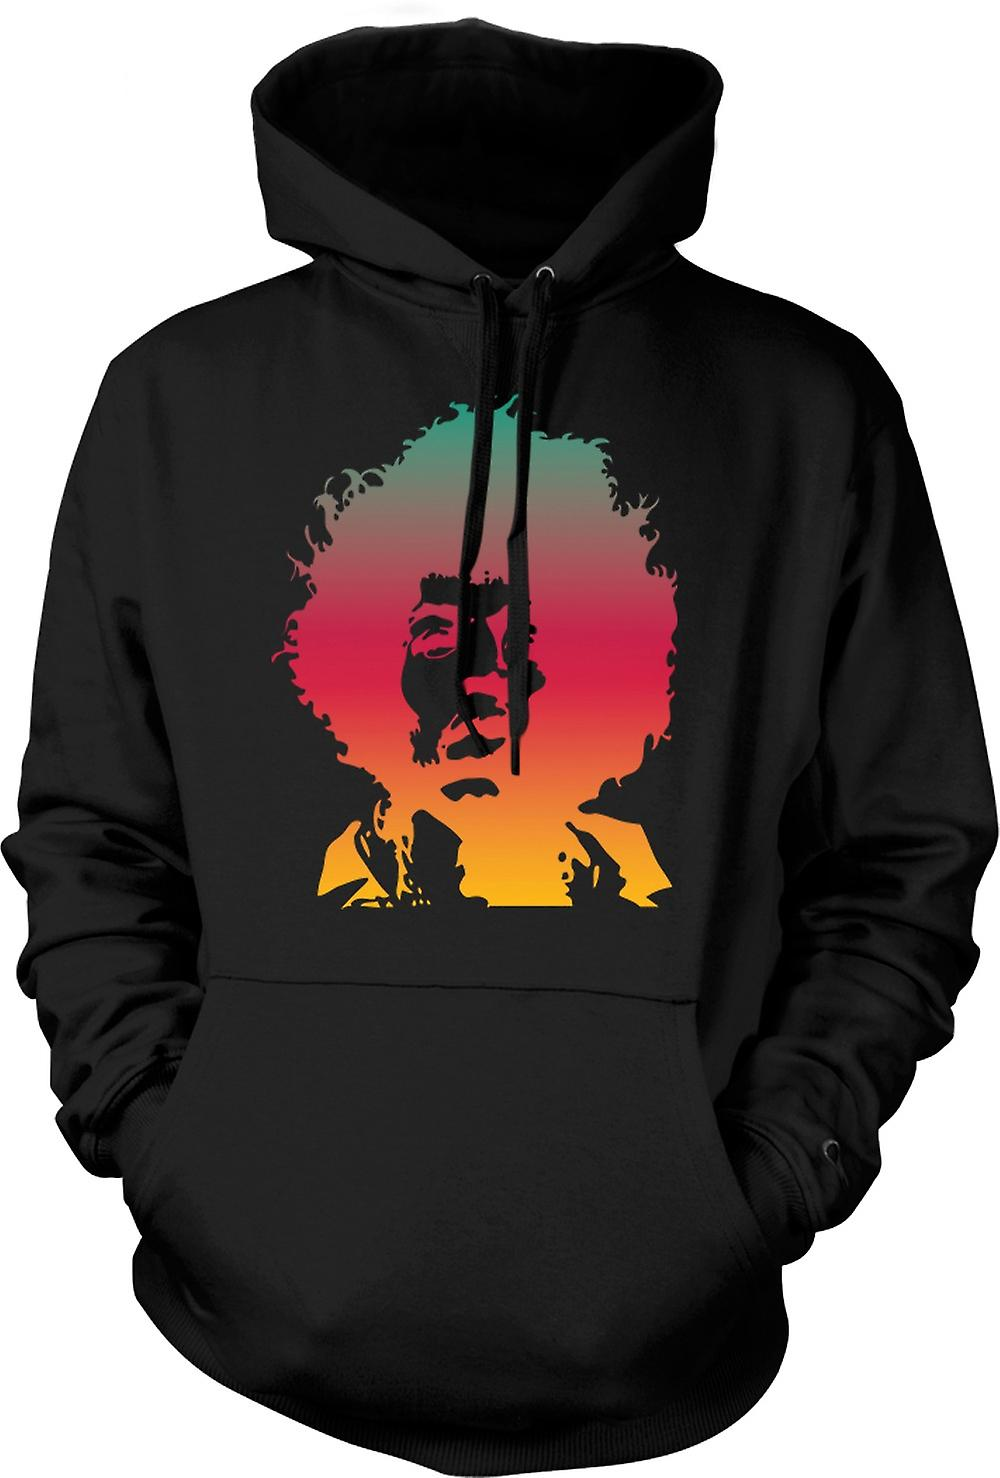 Para hombre con capucha - fresco retrato de Jimi Hendrix